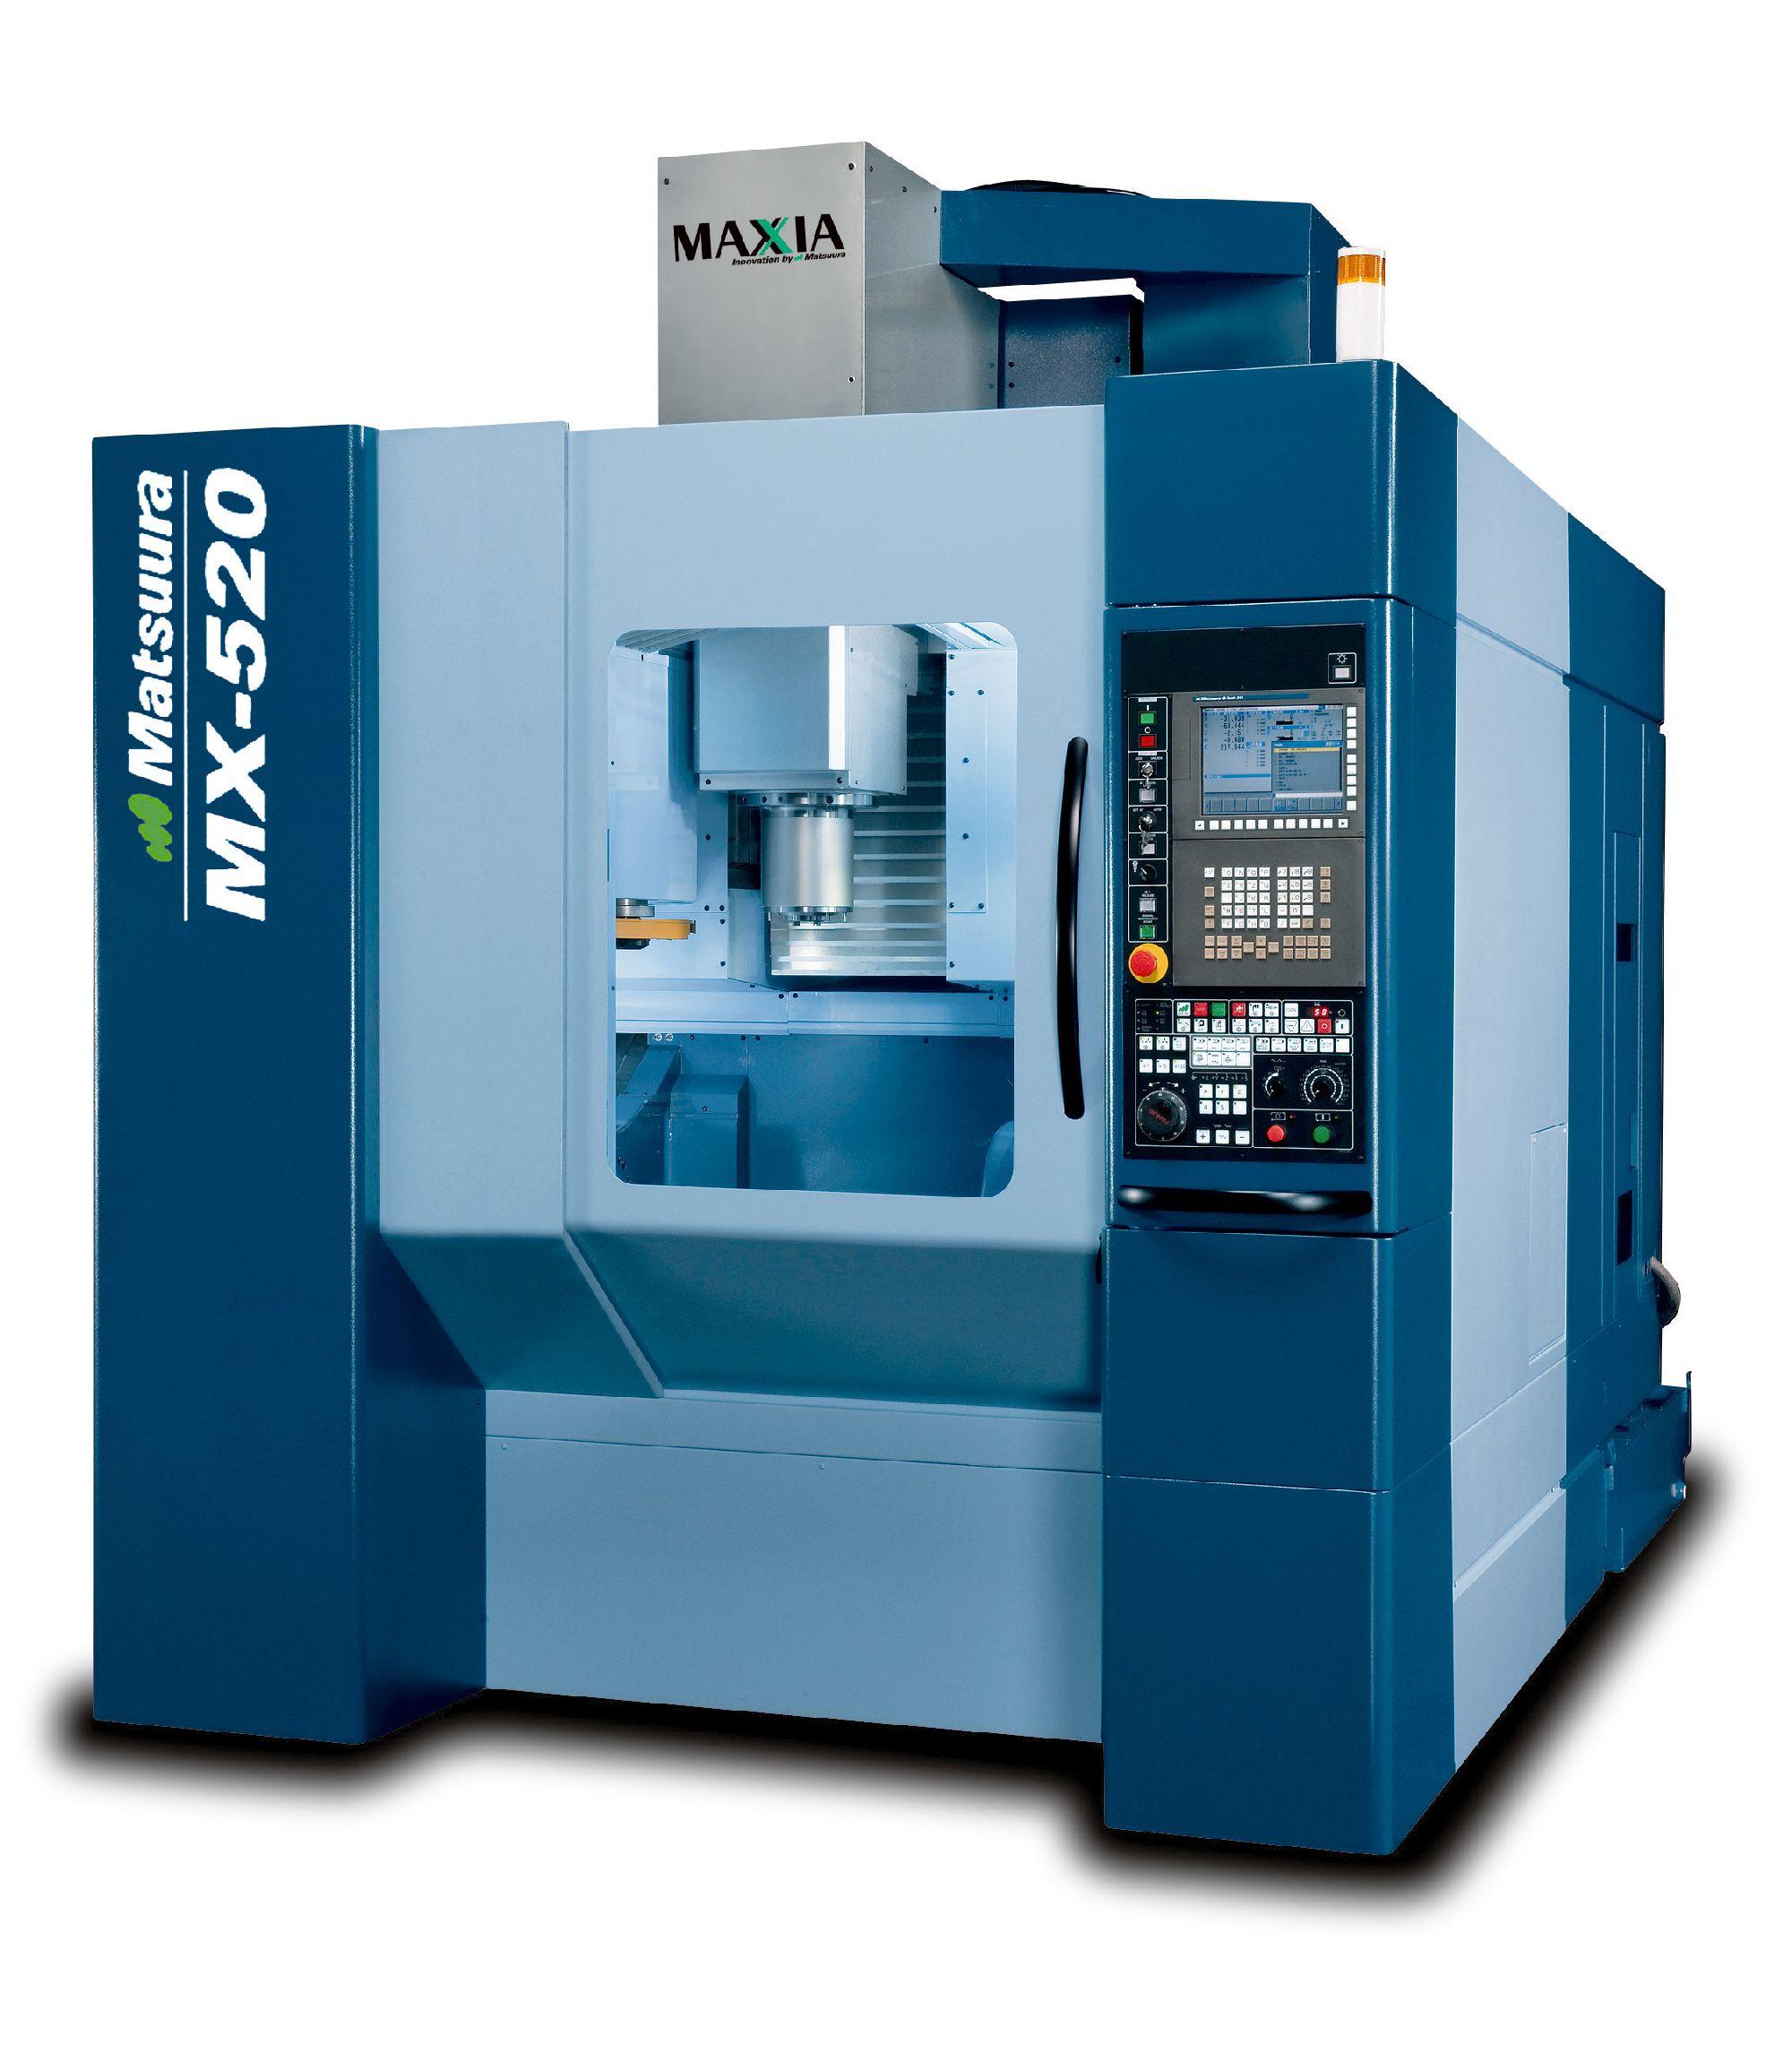 Matsuura MX 520